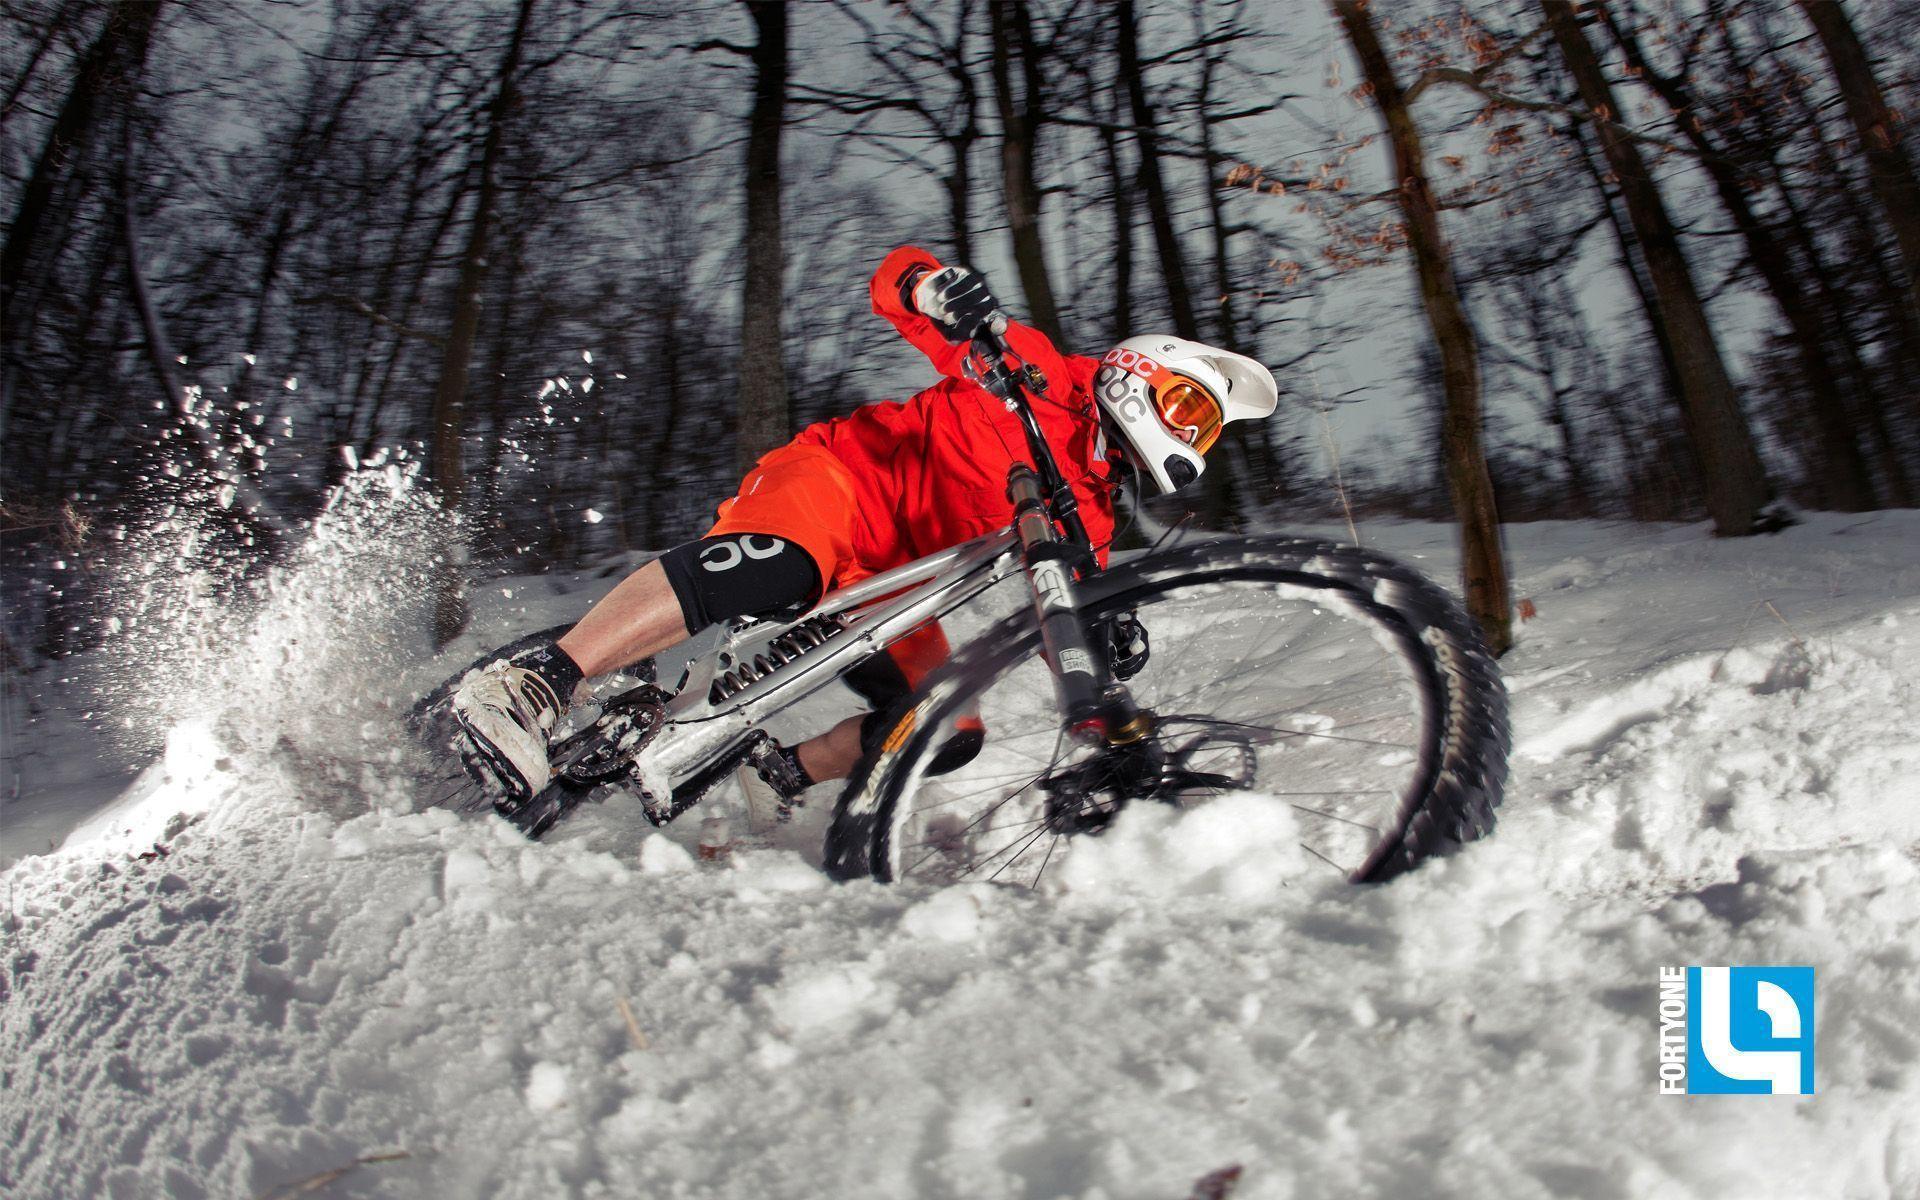 wallpaper bike sport downhill - photo #19